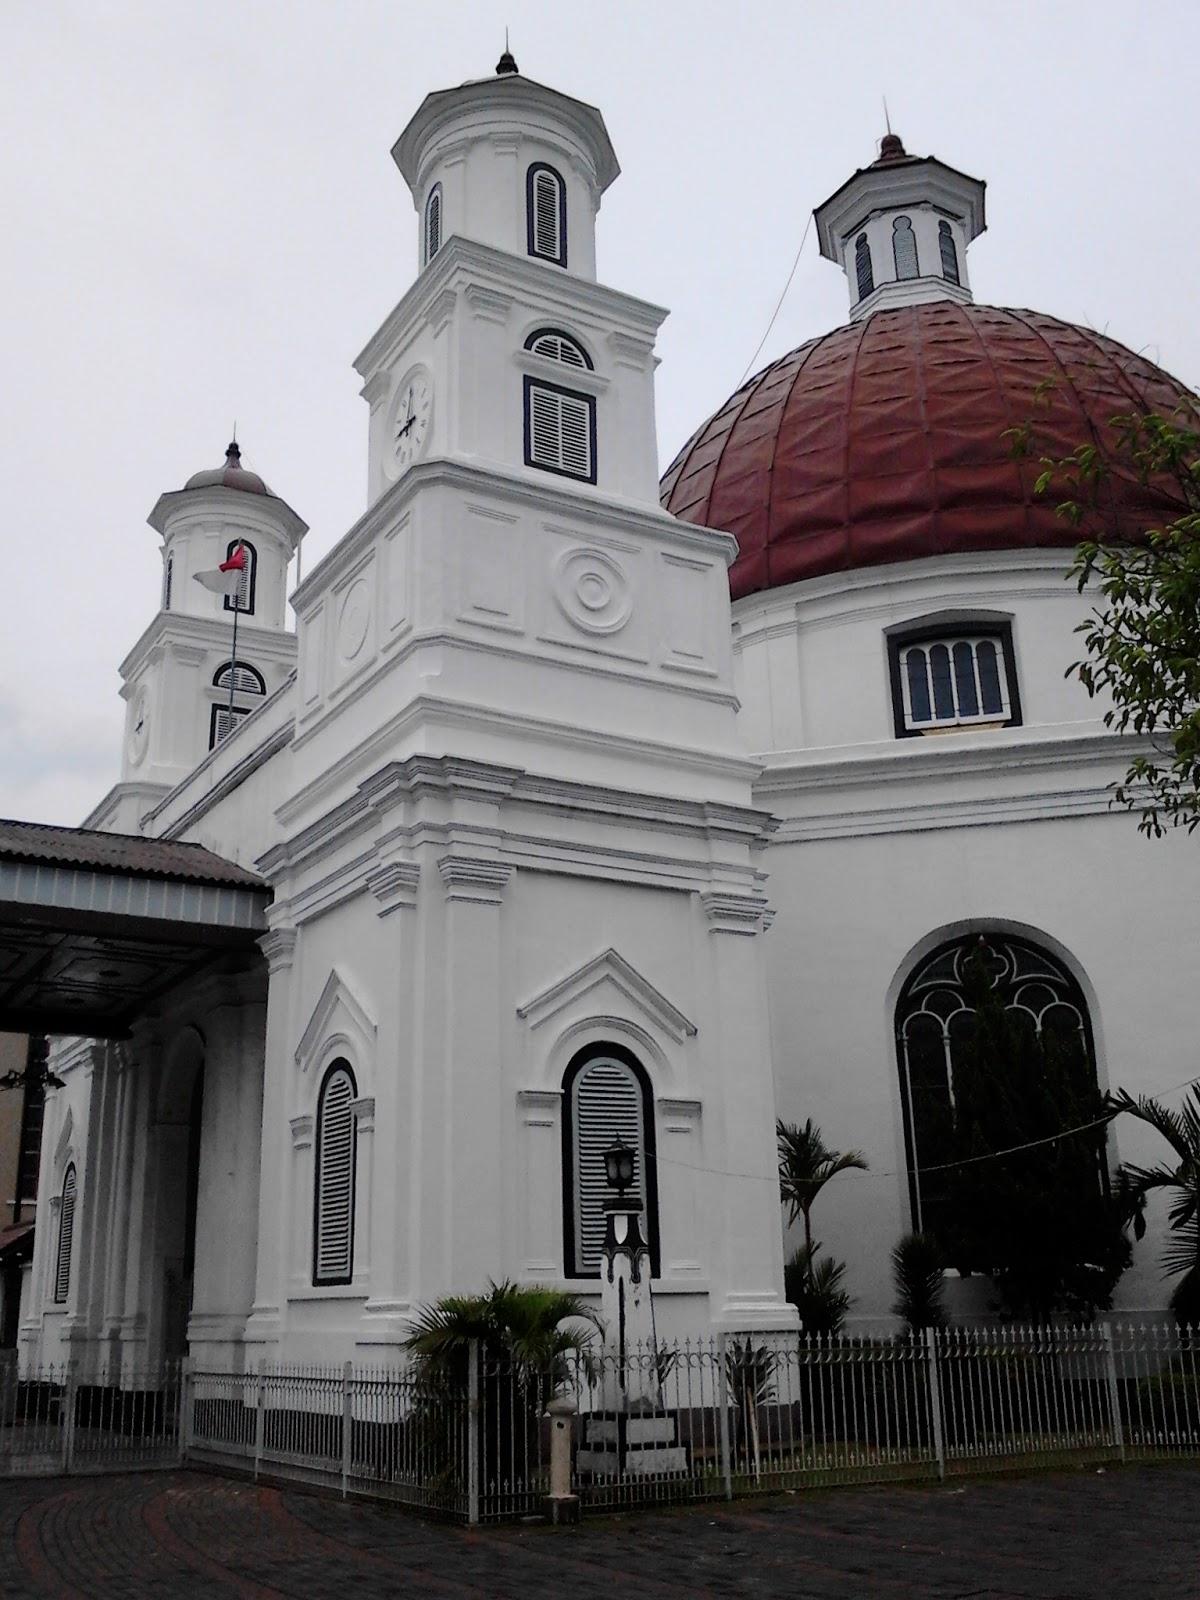 Seputar Kudus Semarang Gereja Blenduk Kota Kab